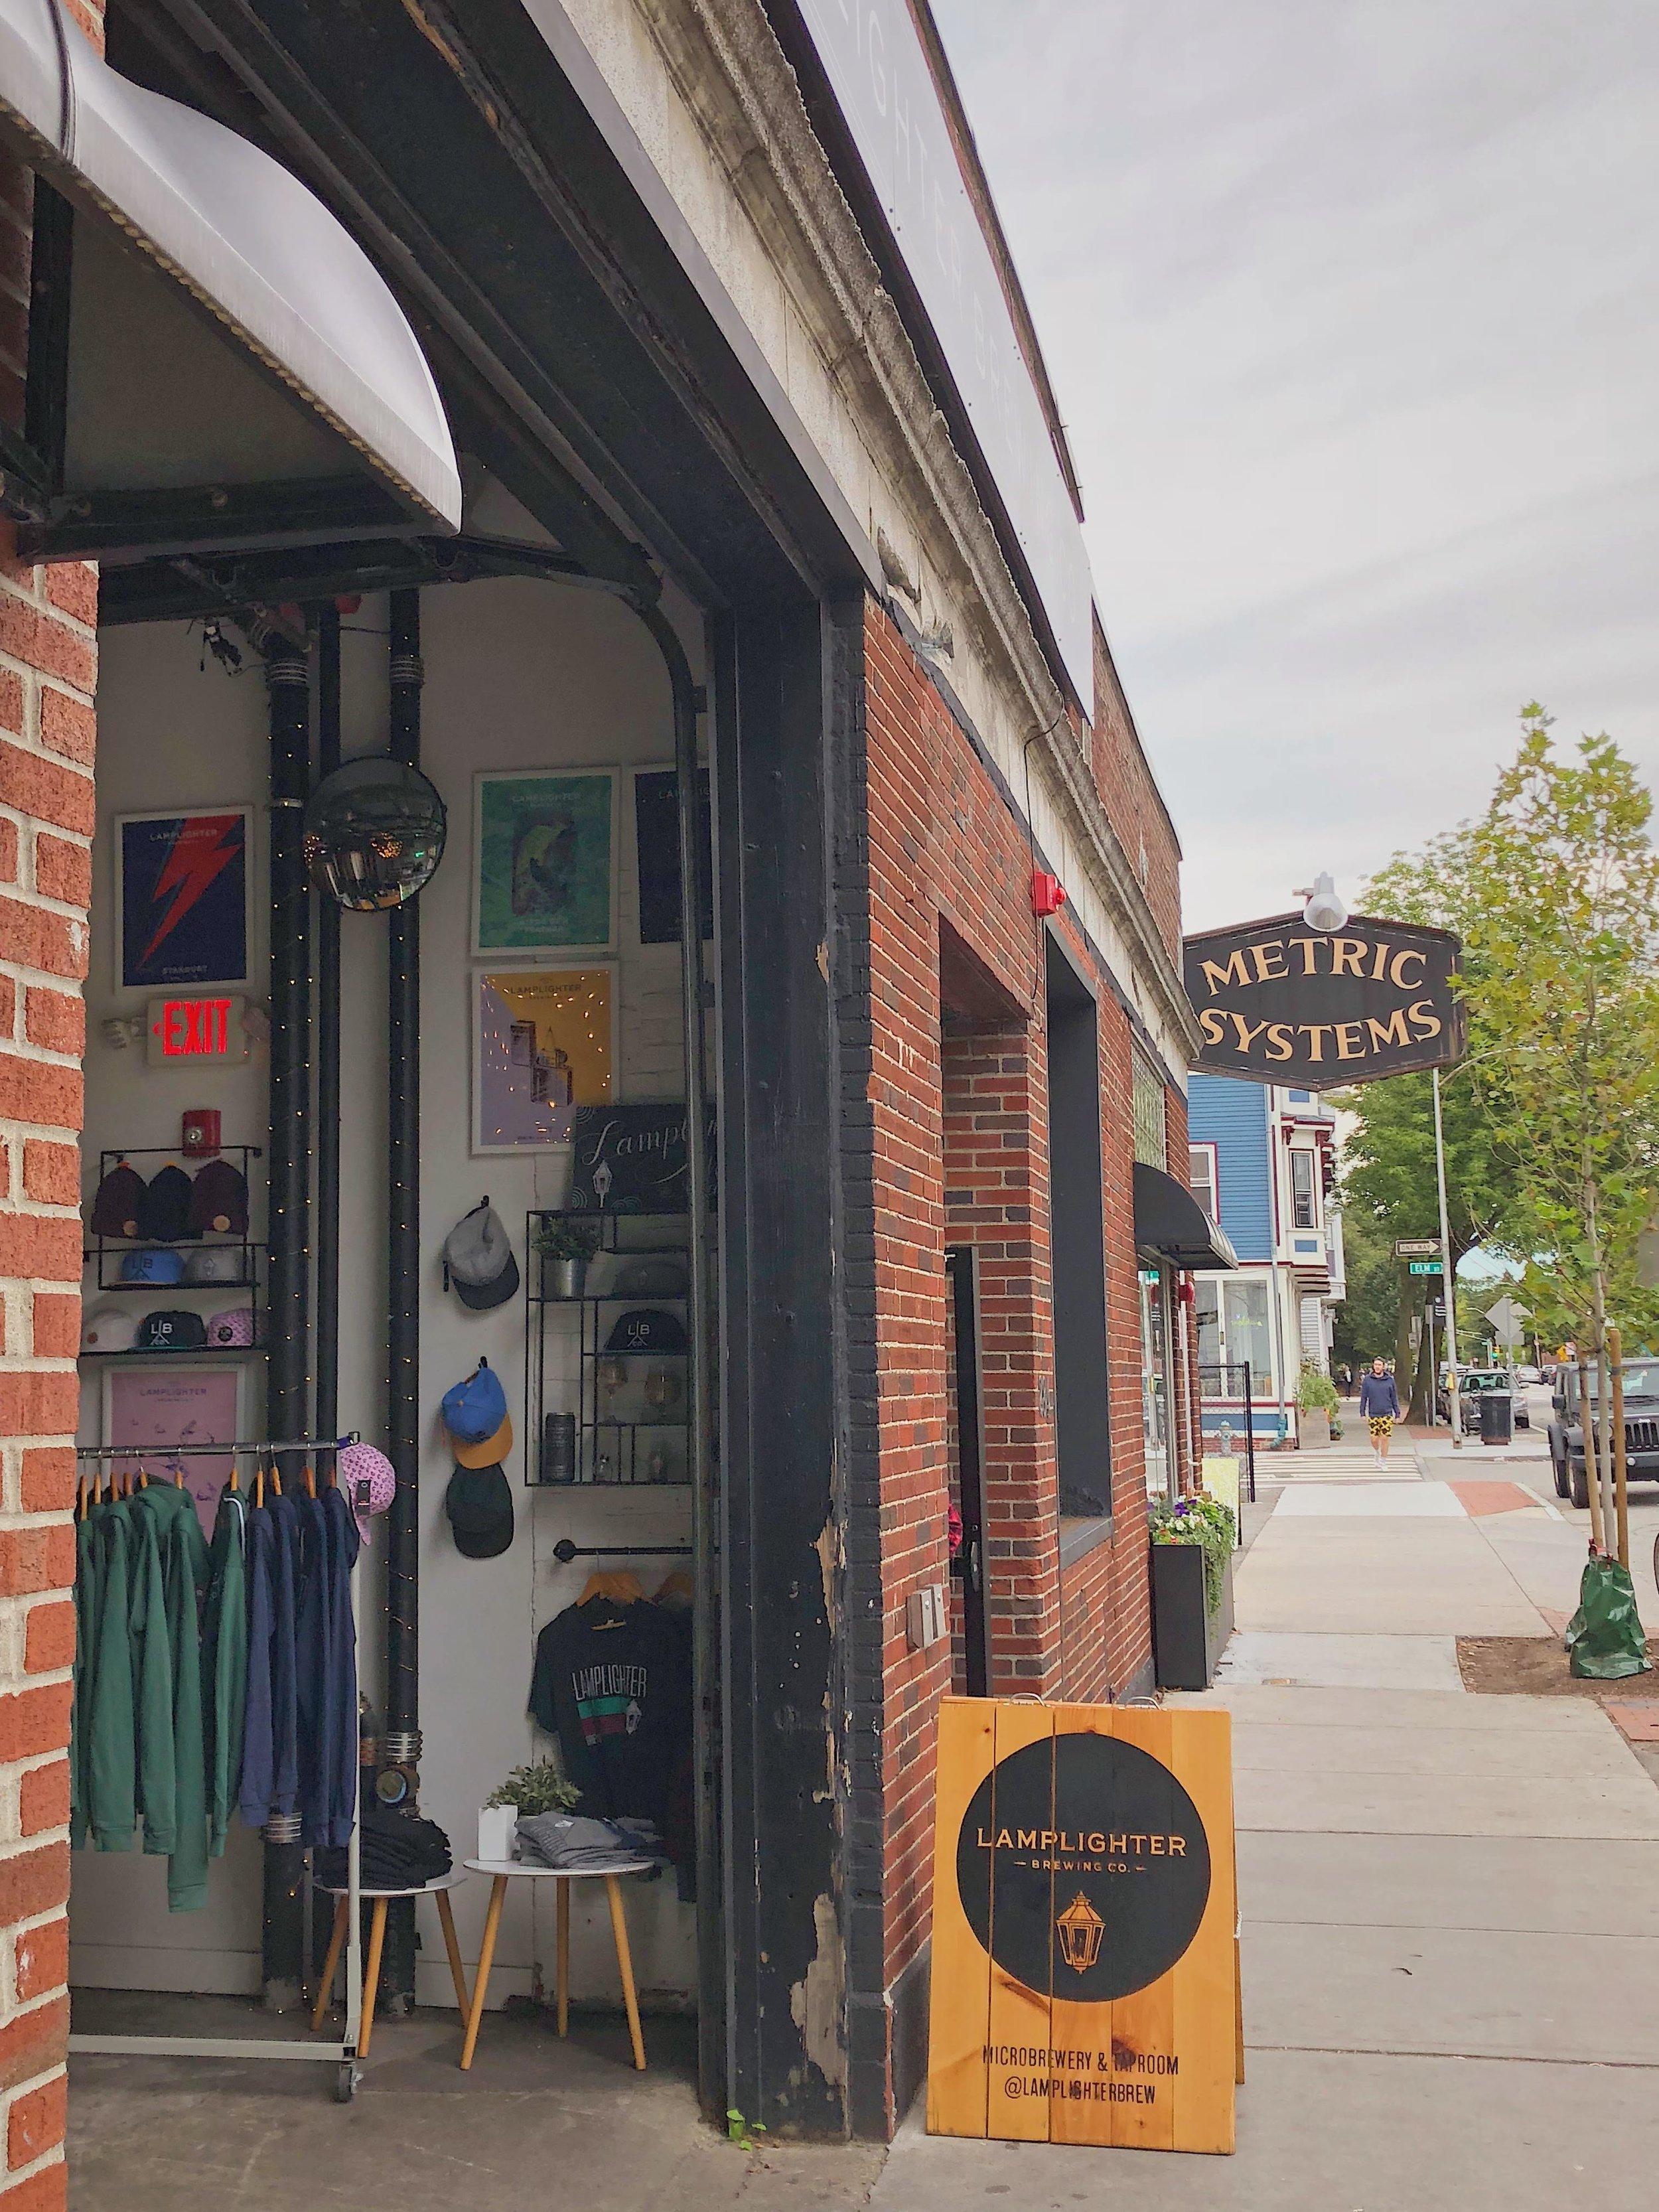 Cambridge (US) - 1. Broadsheet Coffee Roasters2. Longfellows3. Diesel CafeFull Boston area list here.